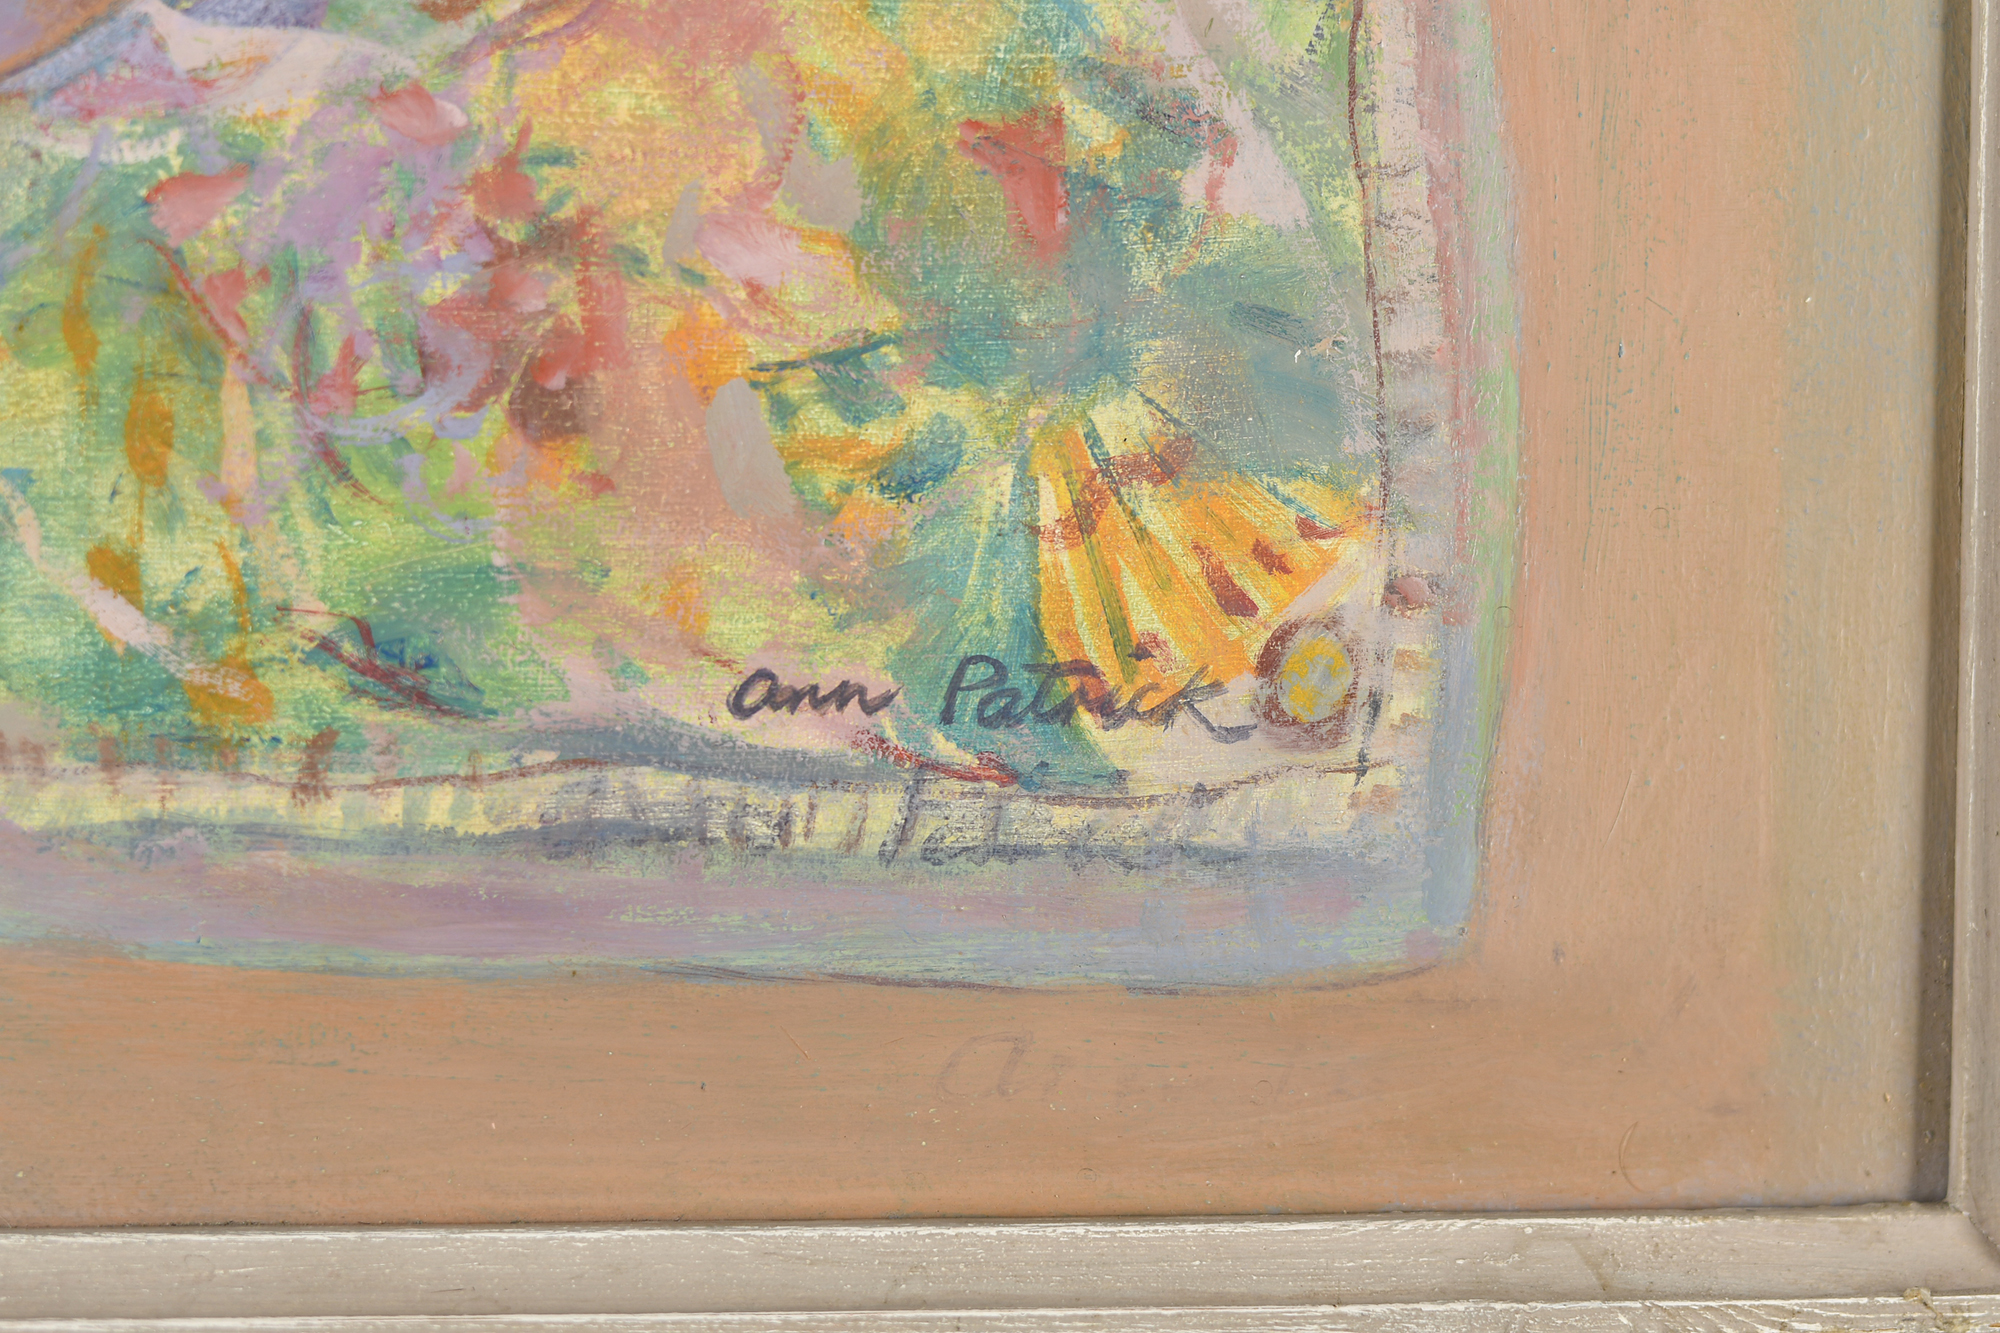 Original Oil Painting by Scottish Artist Ann Patrick. - Image 4 of 9